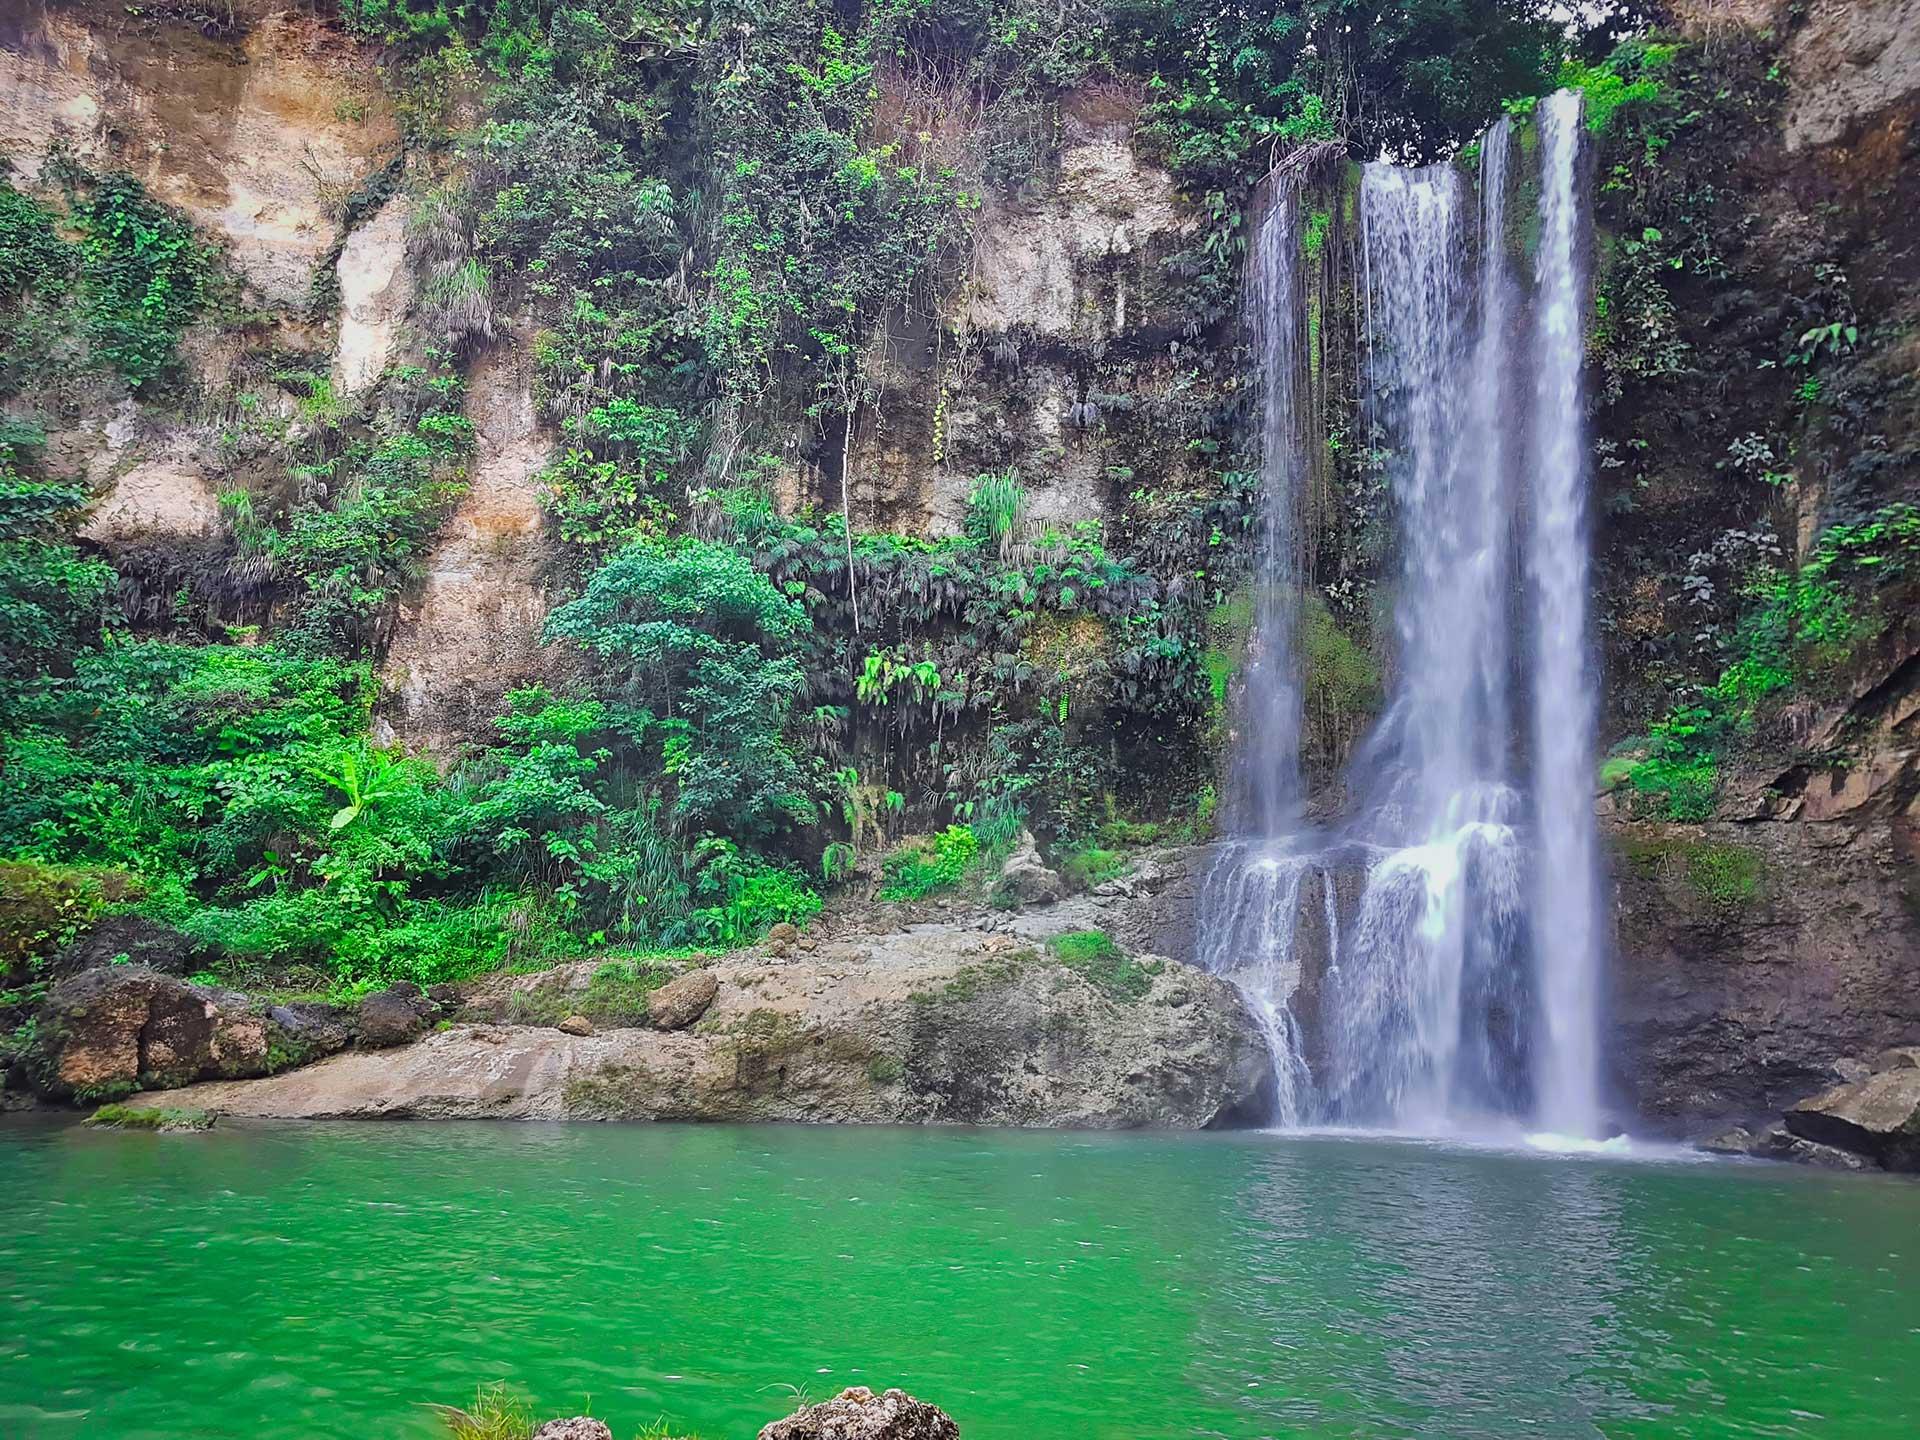 Les chutes de Camugao